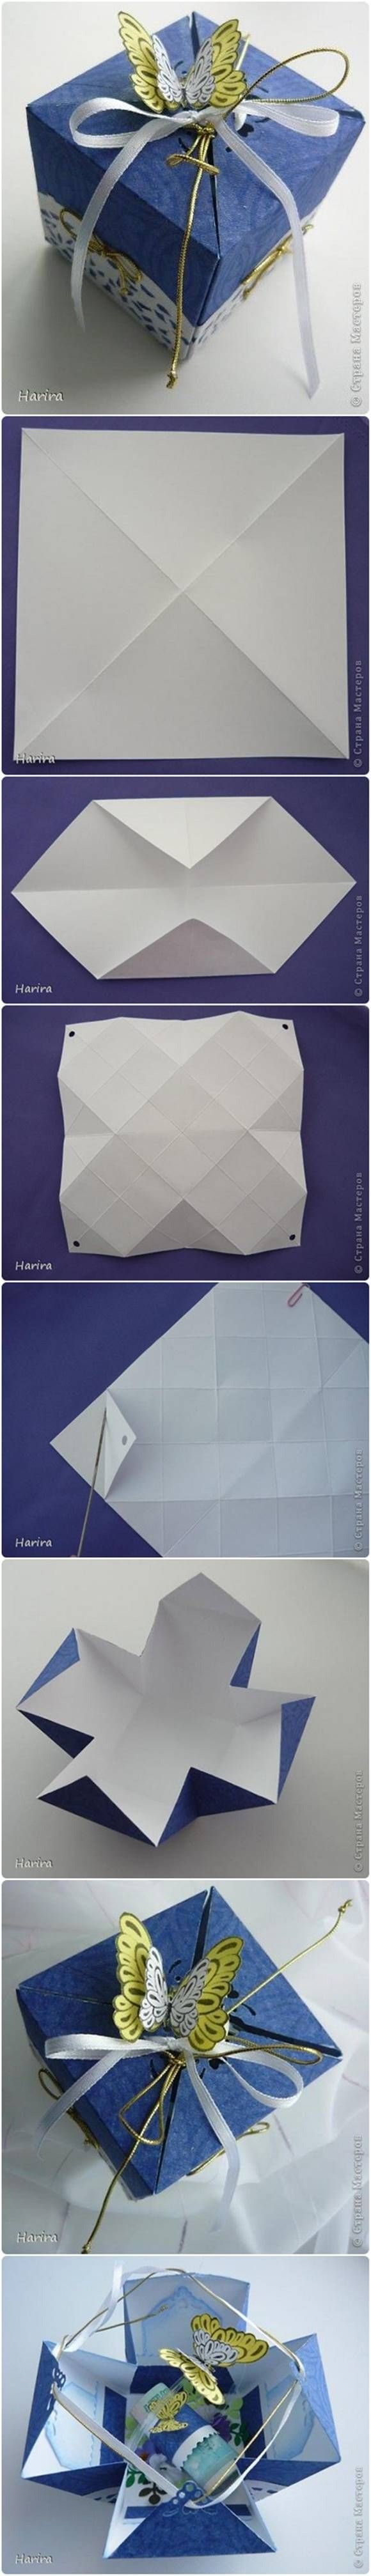 DIY Pretty Origami Gift Box